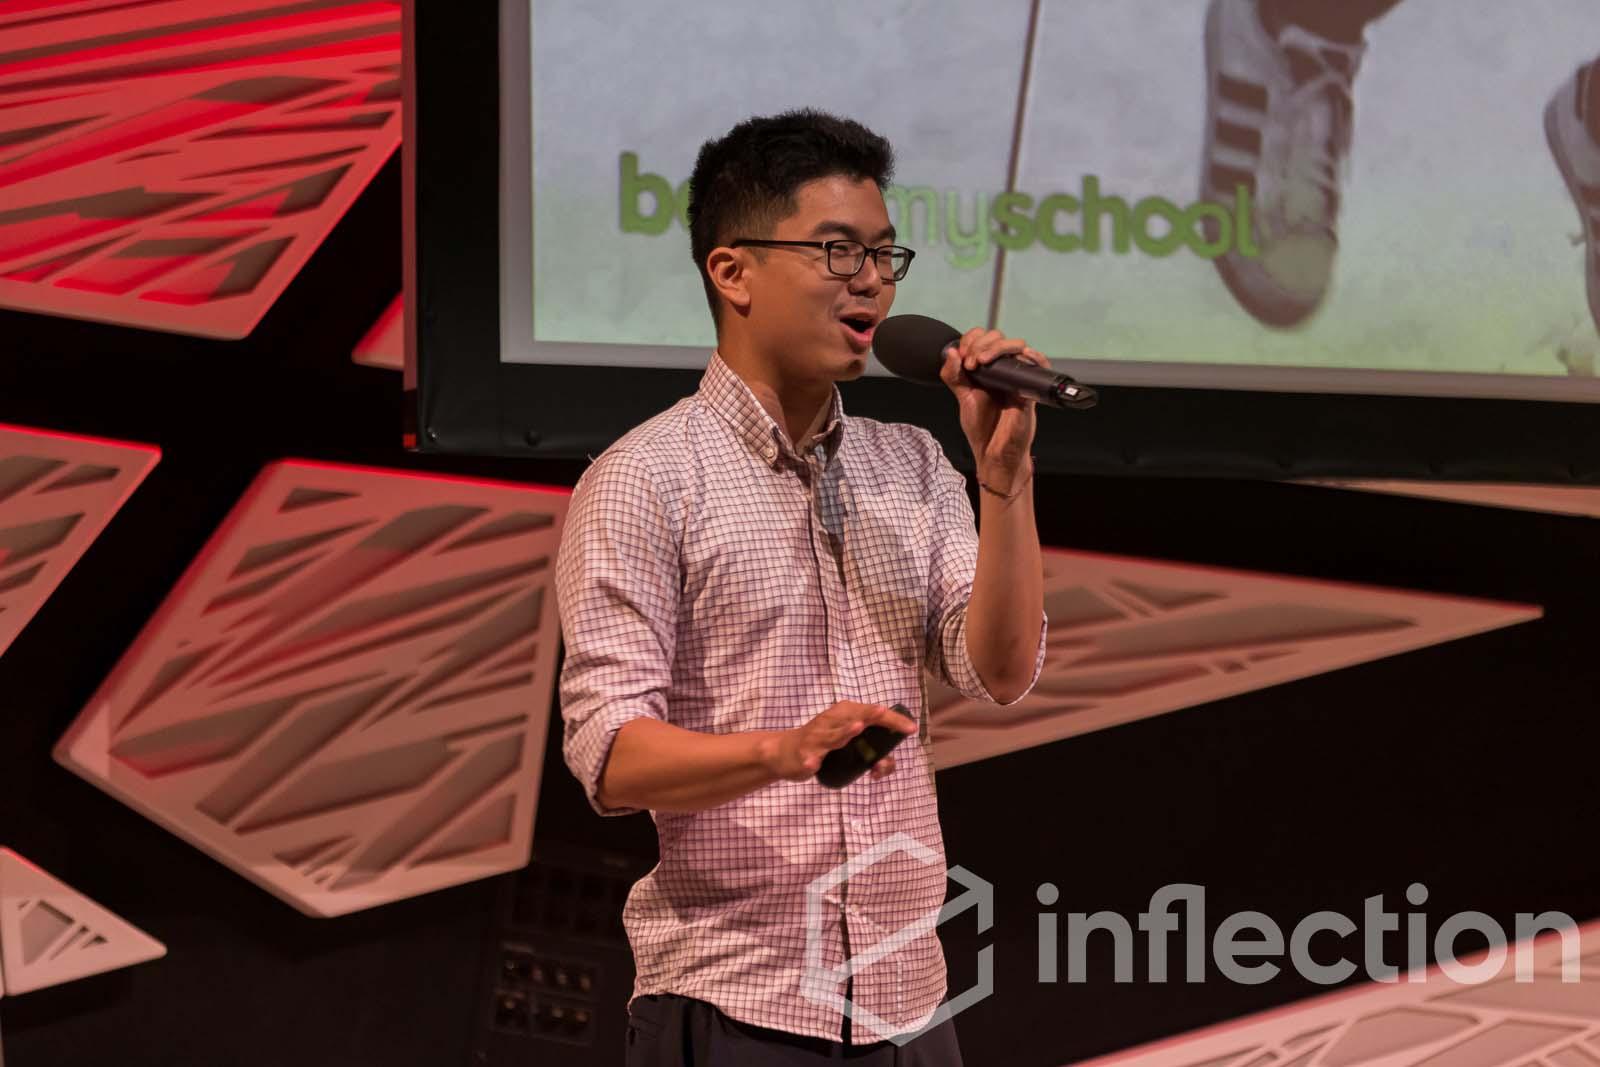 Holman Gao presents the business model for BoostMySchool